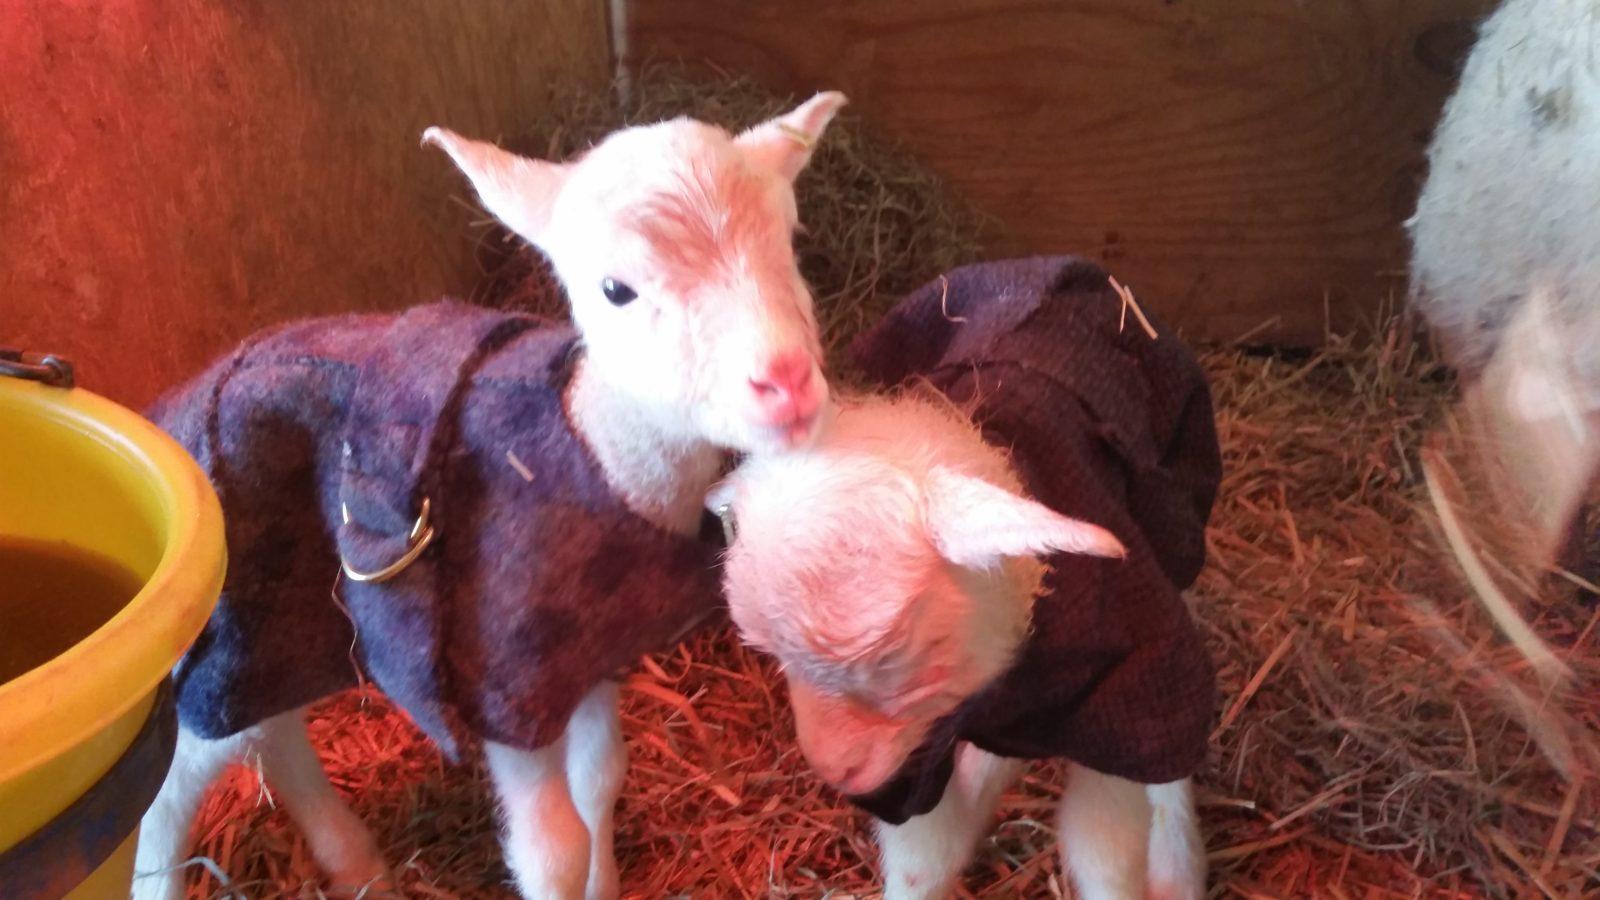 Lambs in coats